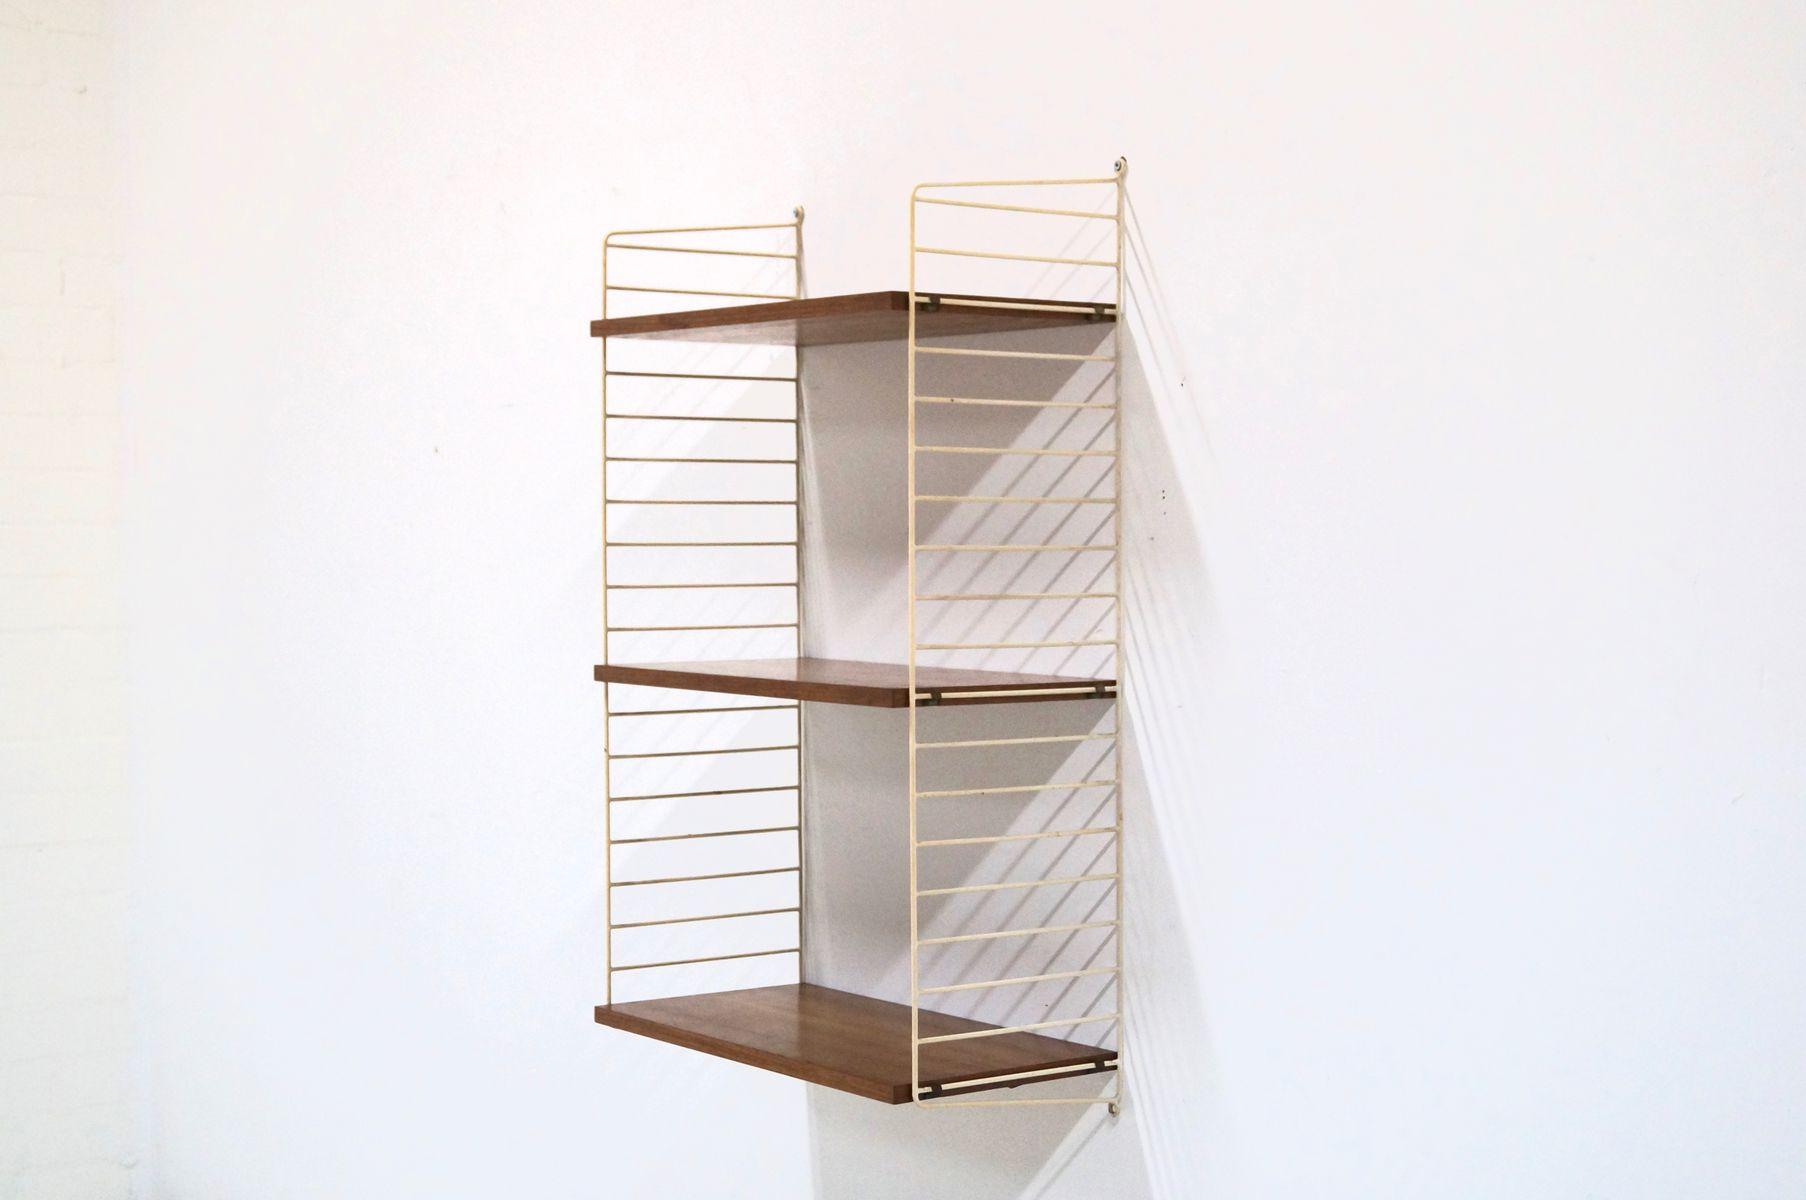 Teak Ladder Shelf Wall Unit By Kajsa & Nils Nisse